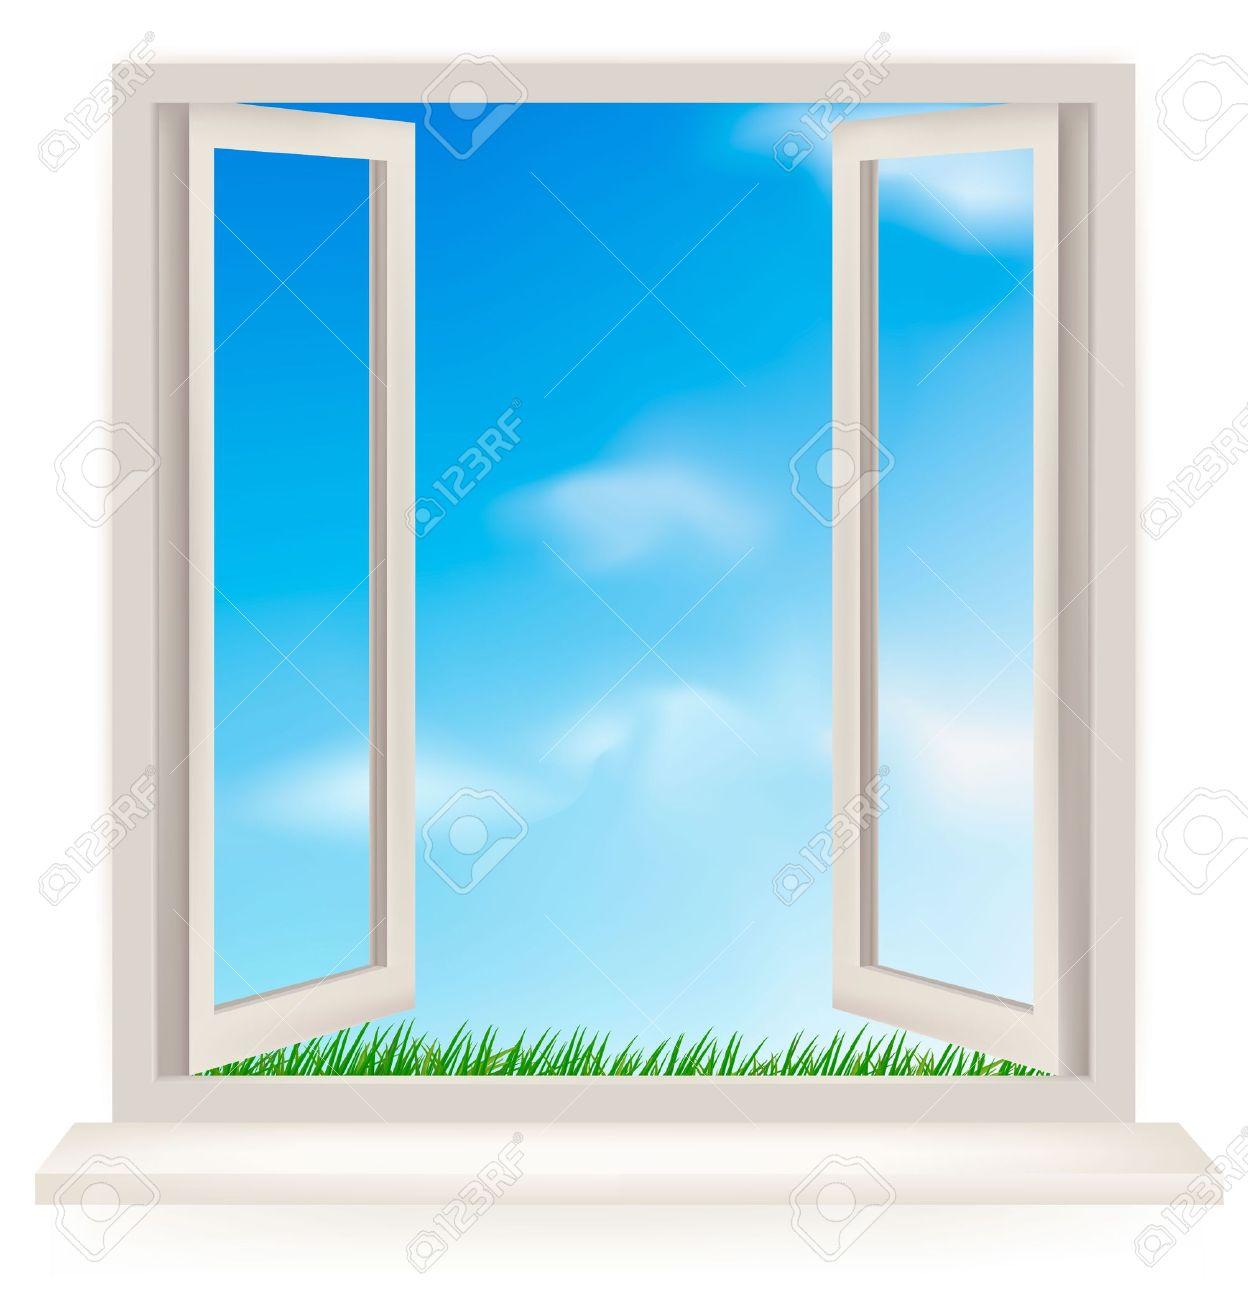 Free window clipart.